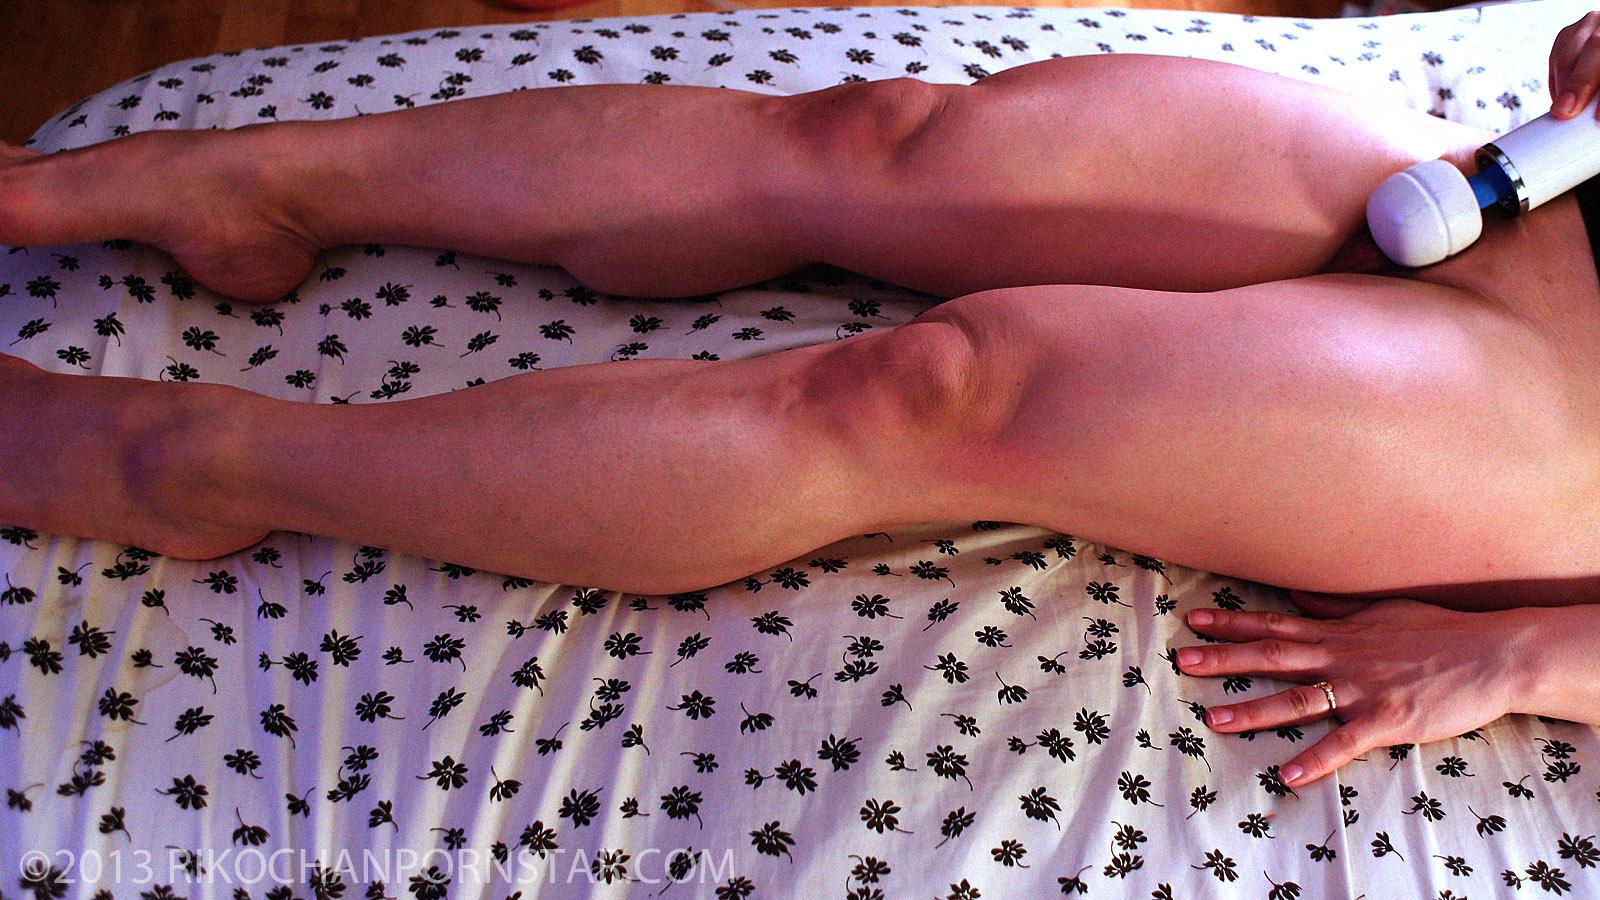 Foot fetish masturbation-6344